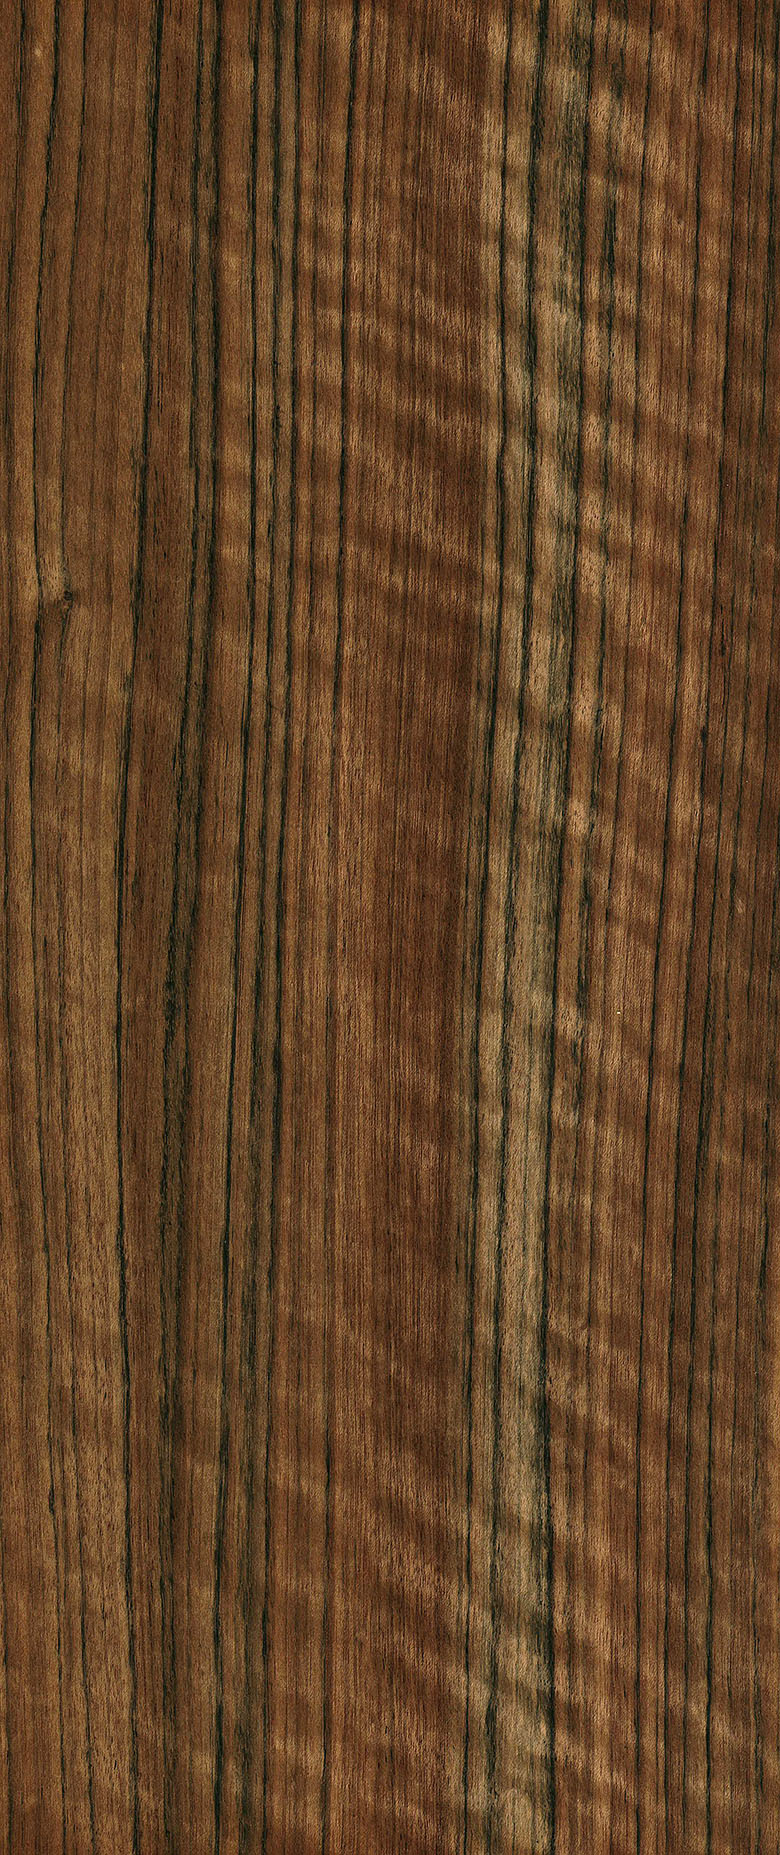 Ovangkol The Wood Database Lumber Identification